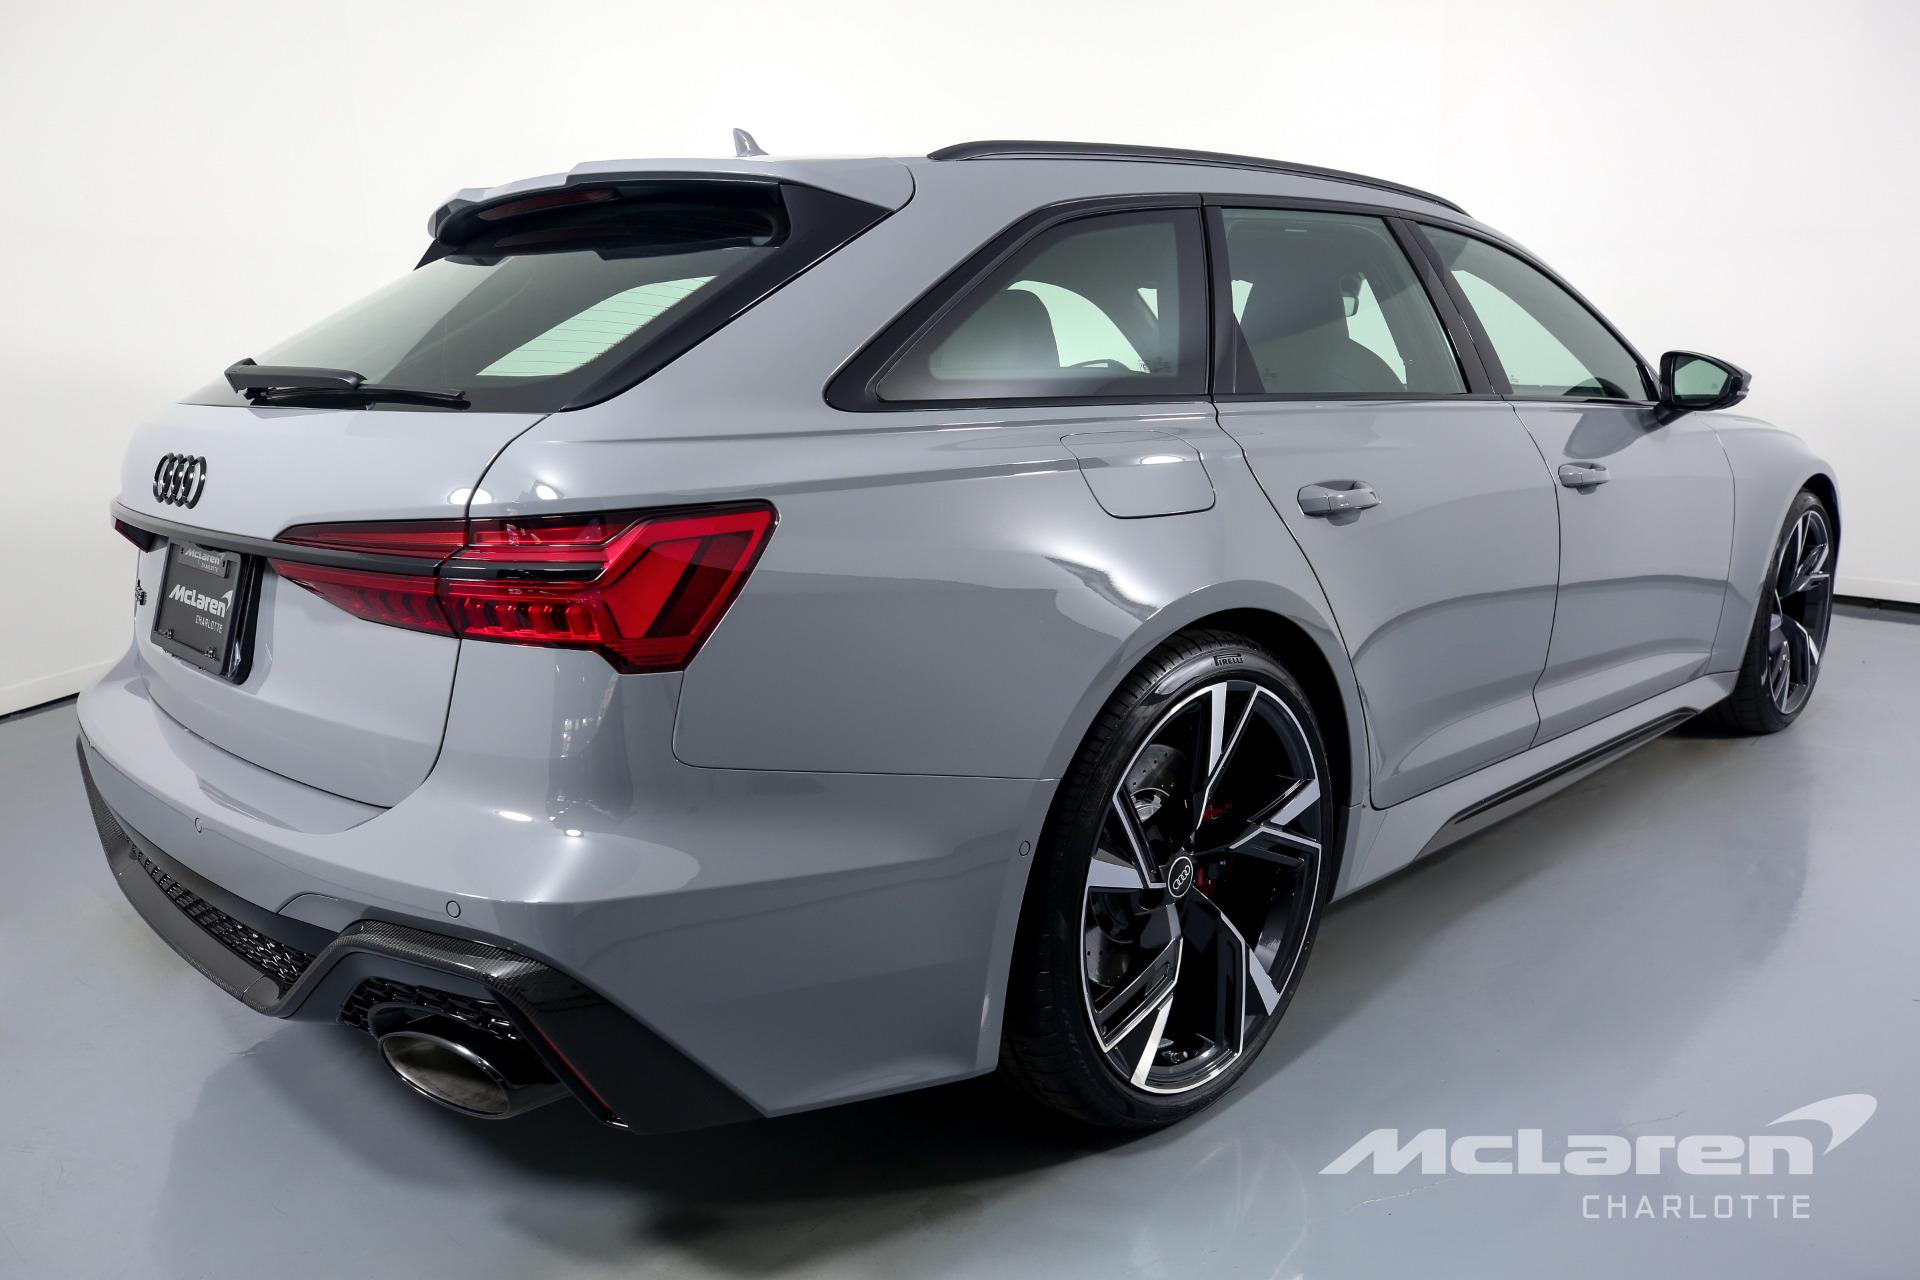 Used 2021 Audi RS 6 4.0T quattro Avant | Charlotte, NC